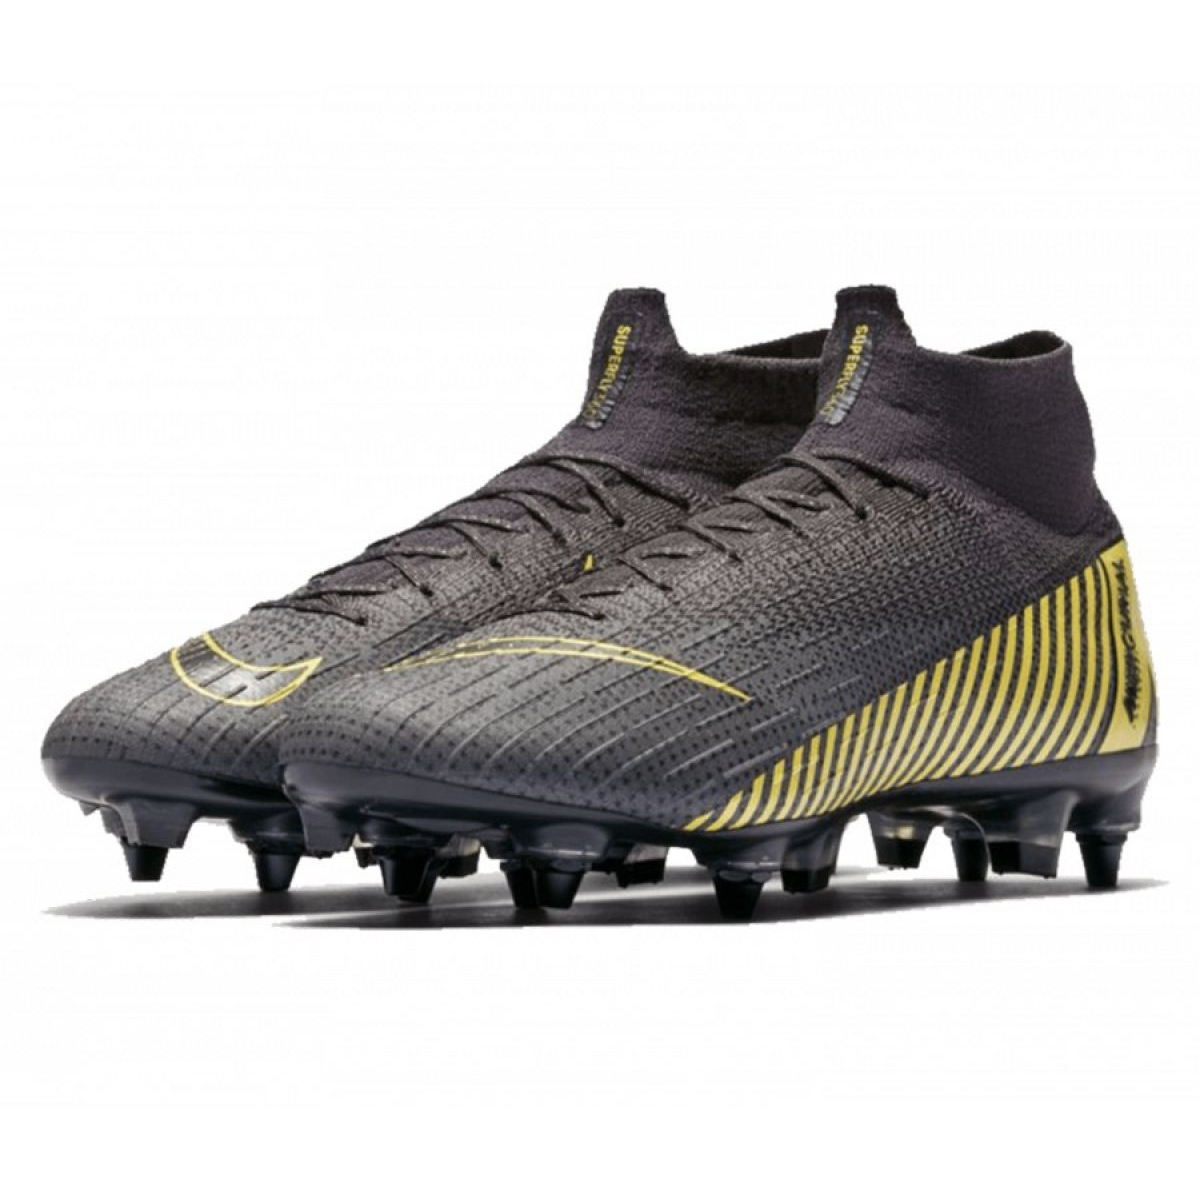 Nike Mercurial Superfly 6 Elite SG Pro Ac M AH7366 077 Football Boots